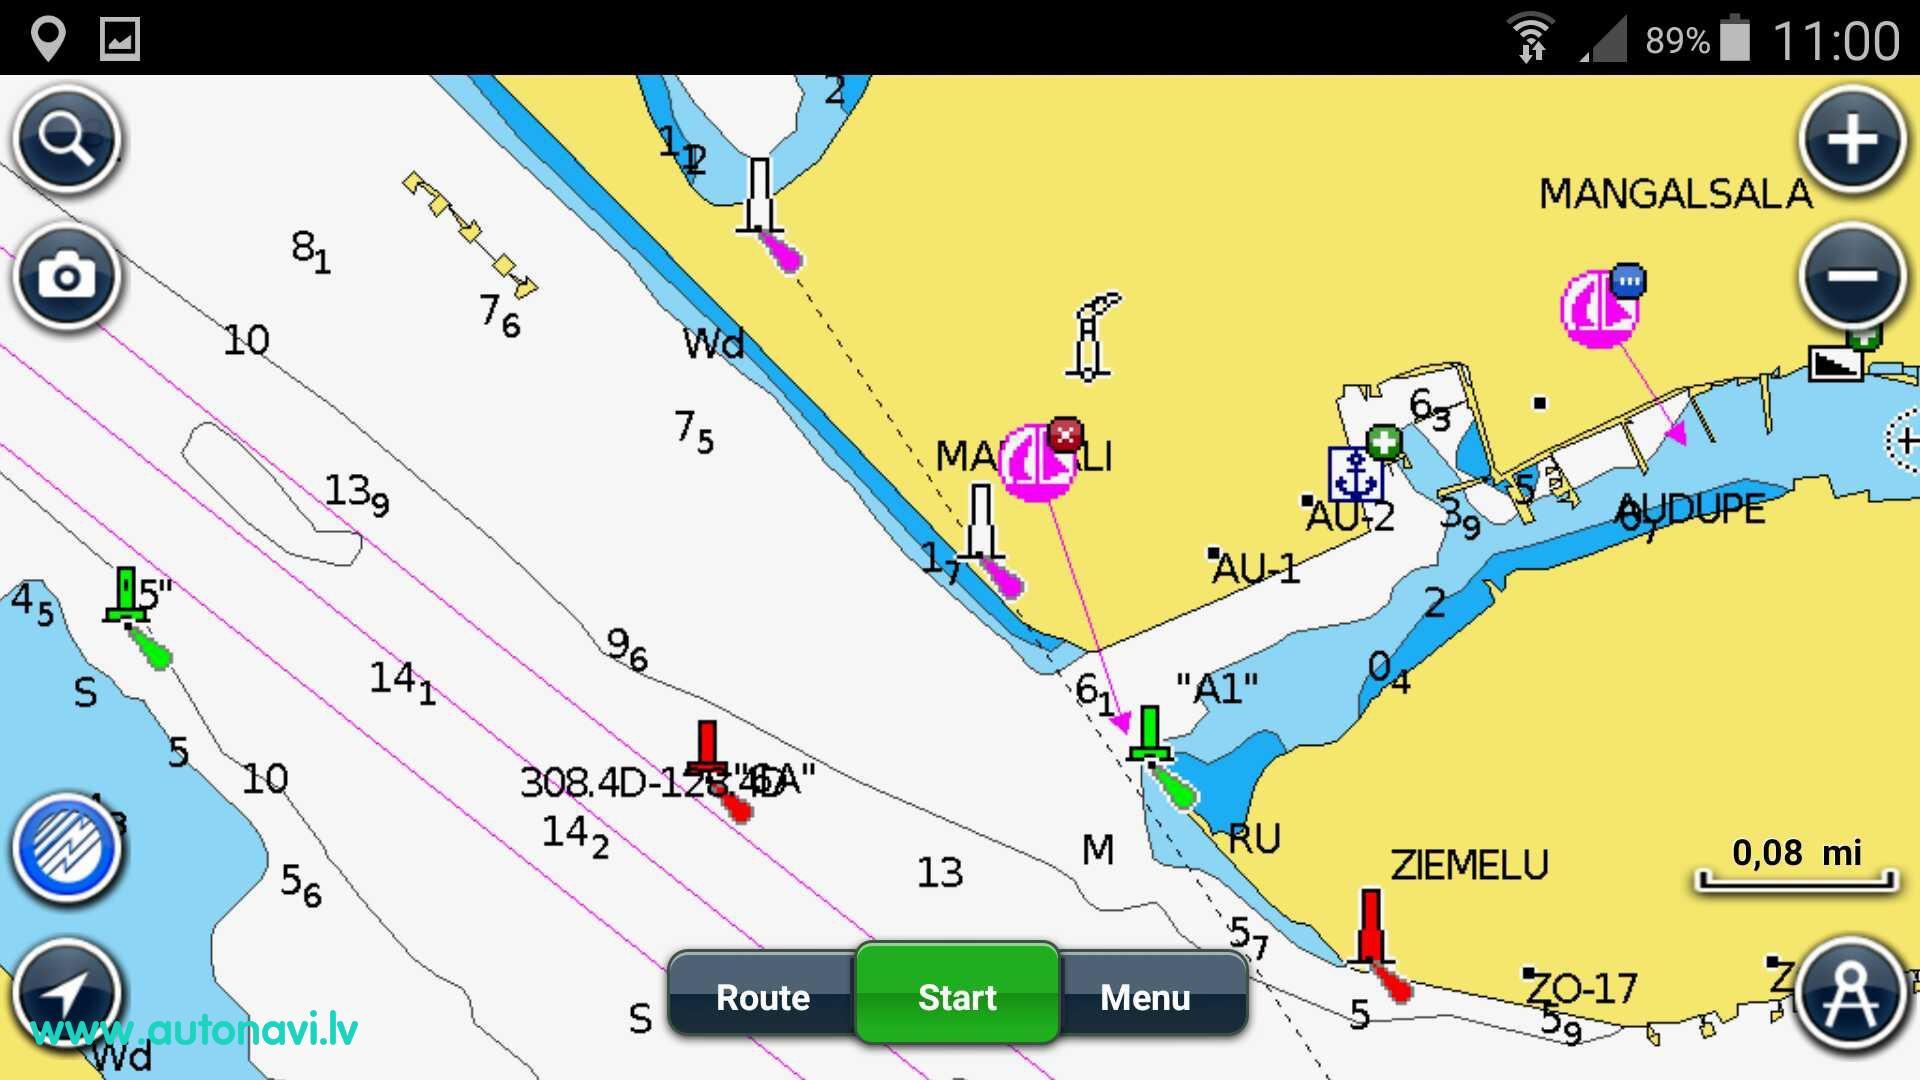 Navionics Baltic Maps Android-53.jpg